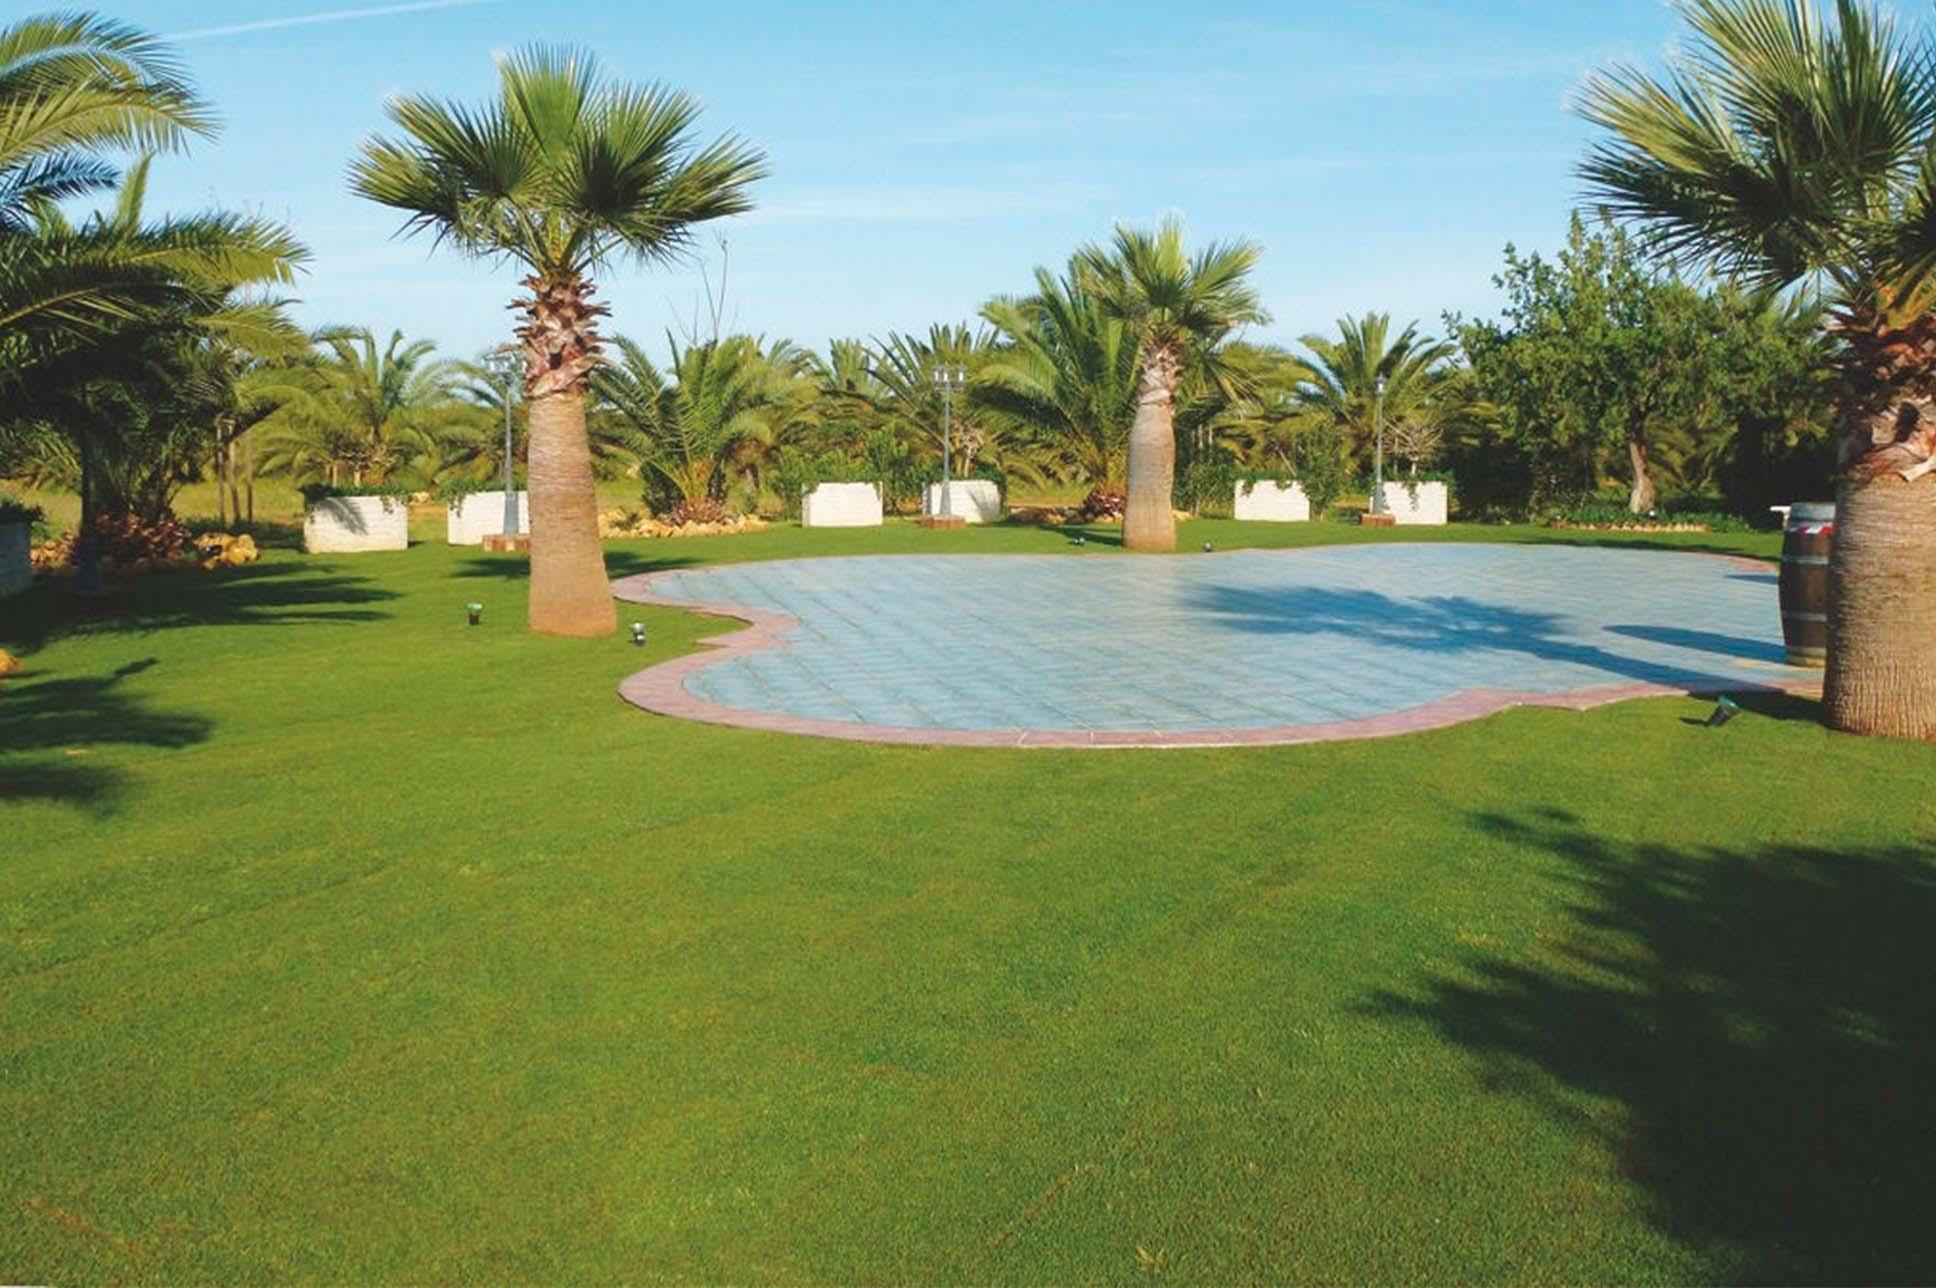 Jardín con pista de baile